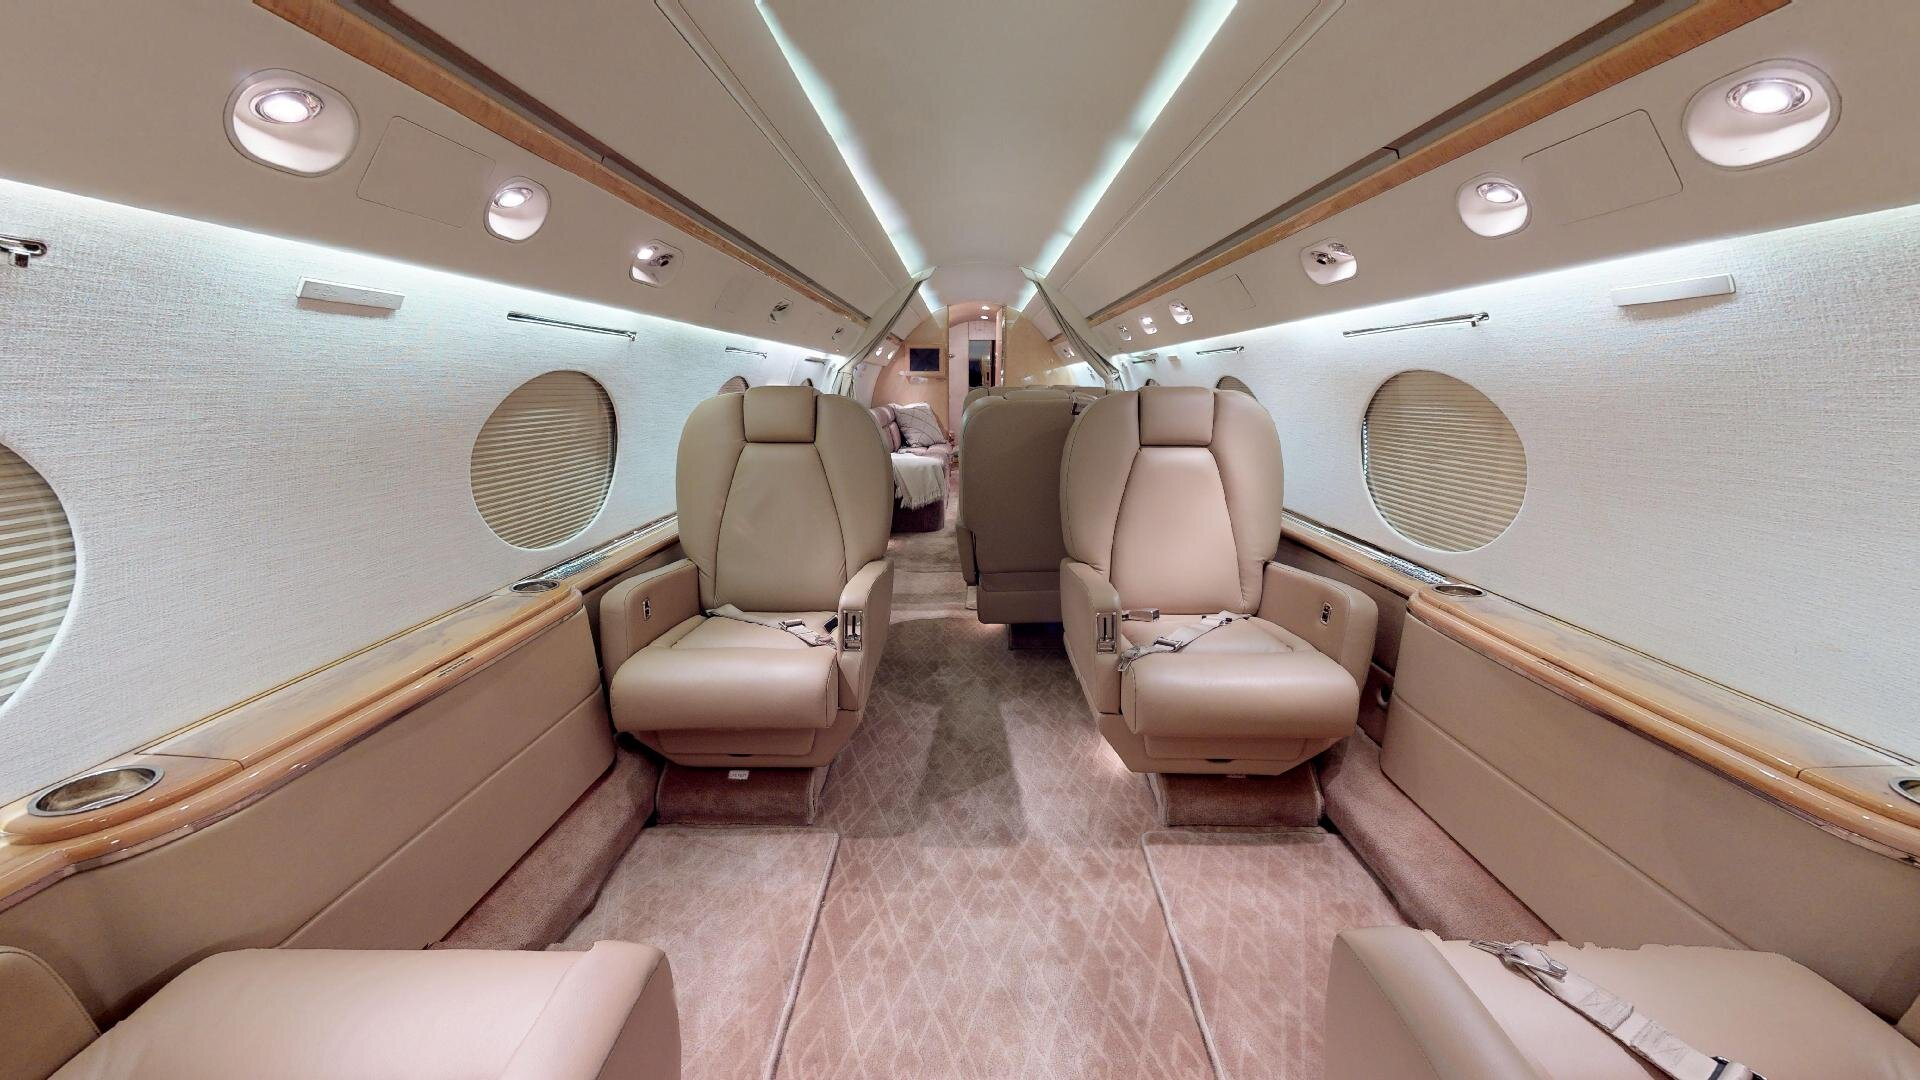 Gulfstream-V-SN-518-09202019_113722.jpg